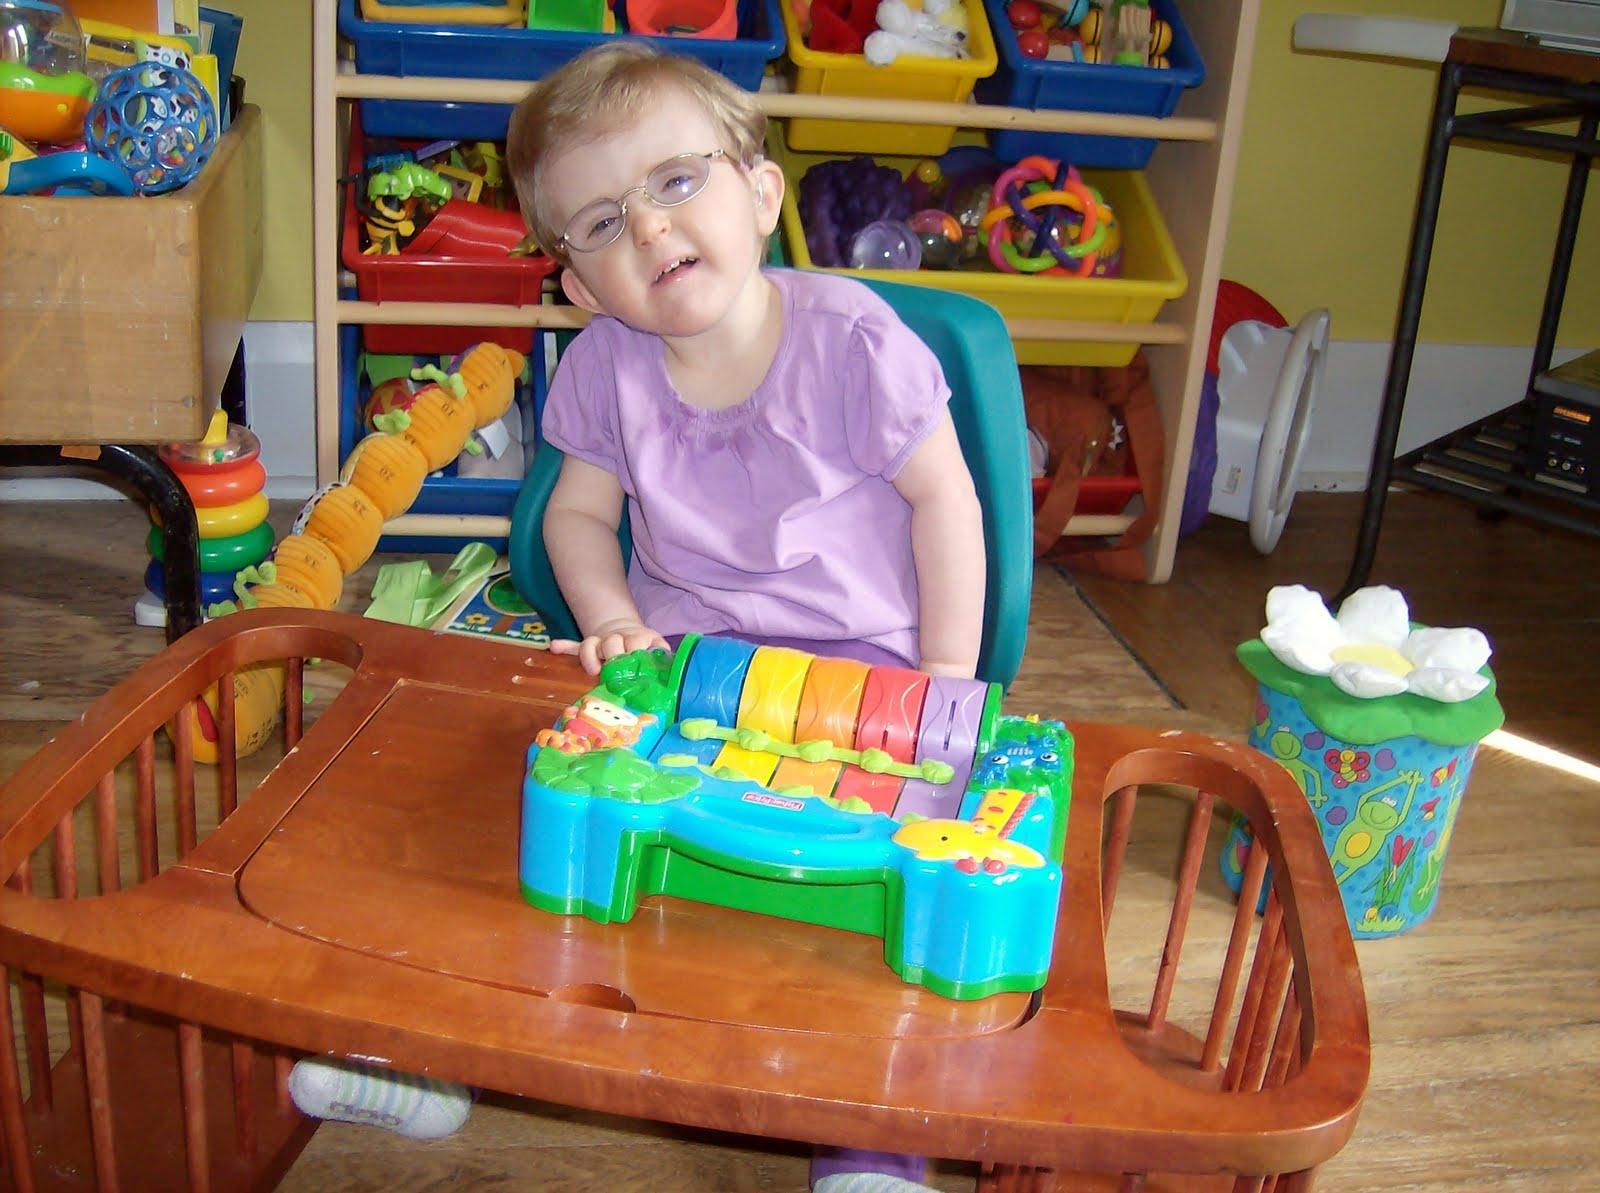 Zoe's 1p36 Blog: A new bath chair, a new playseat, new